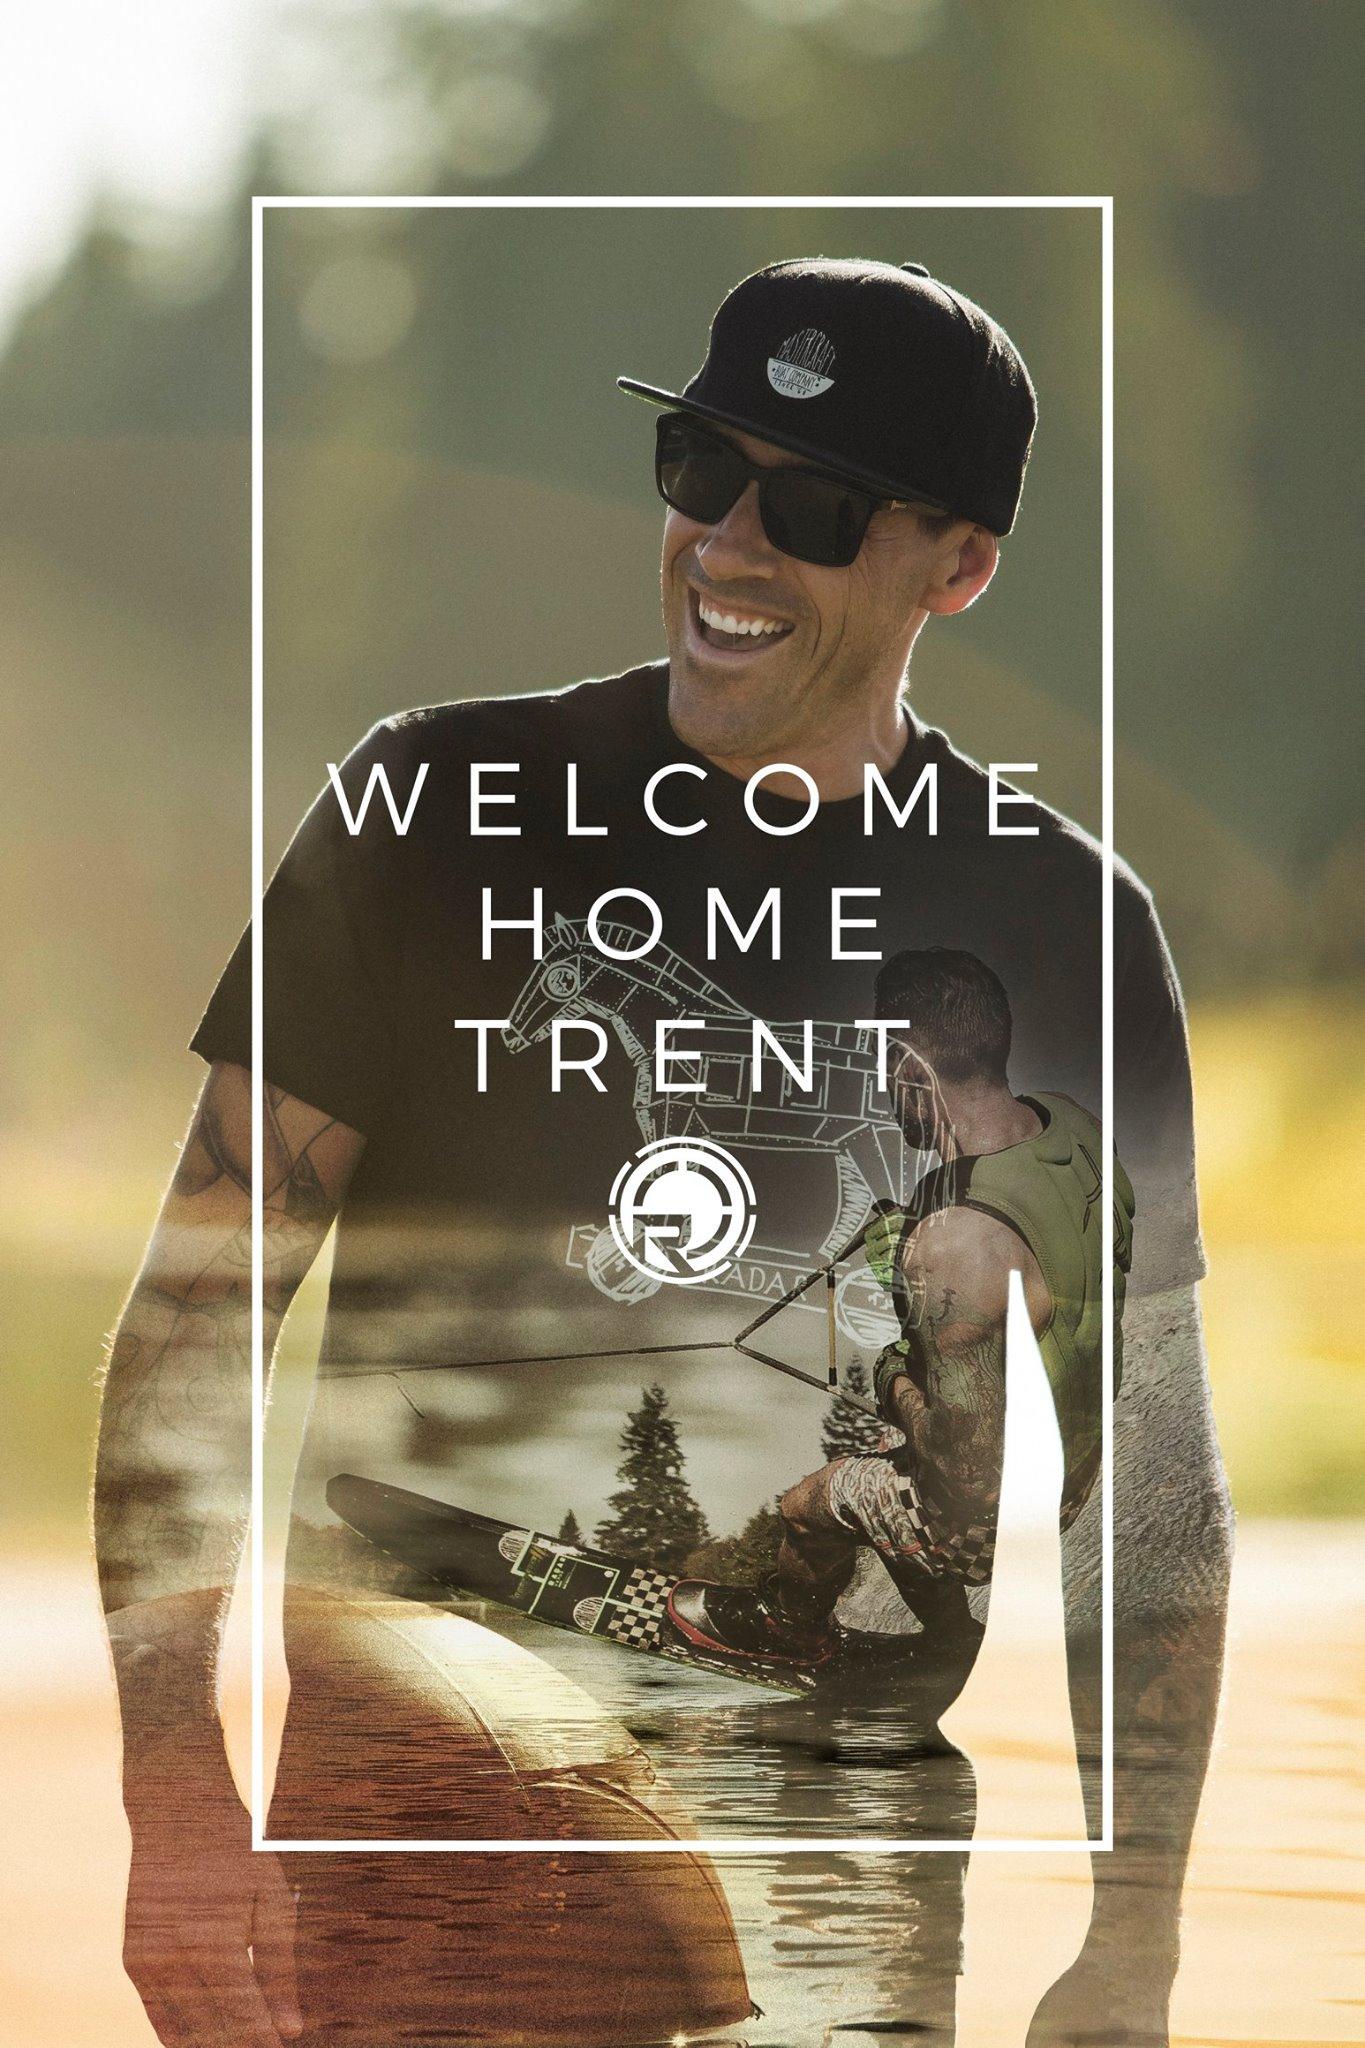 Trent composite.jpg